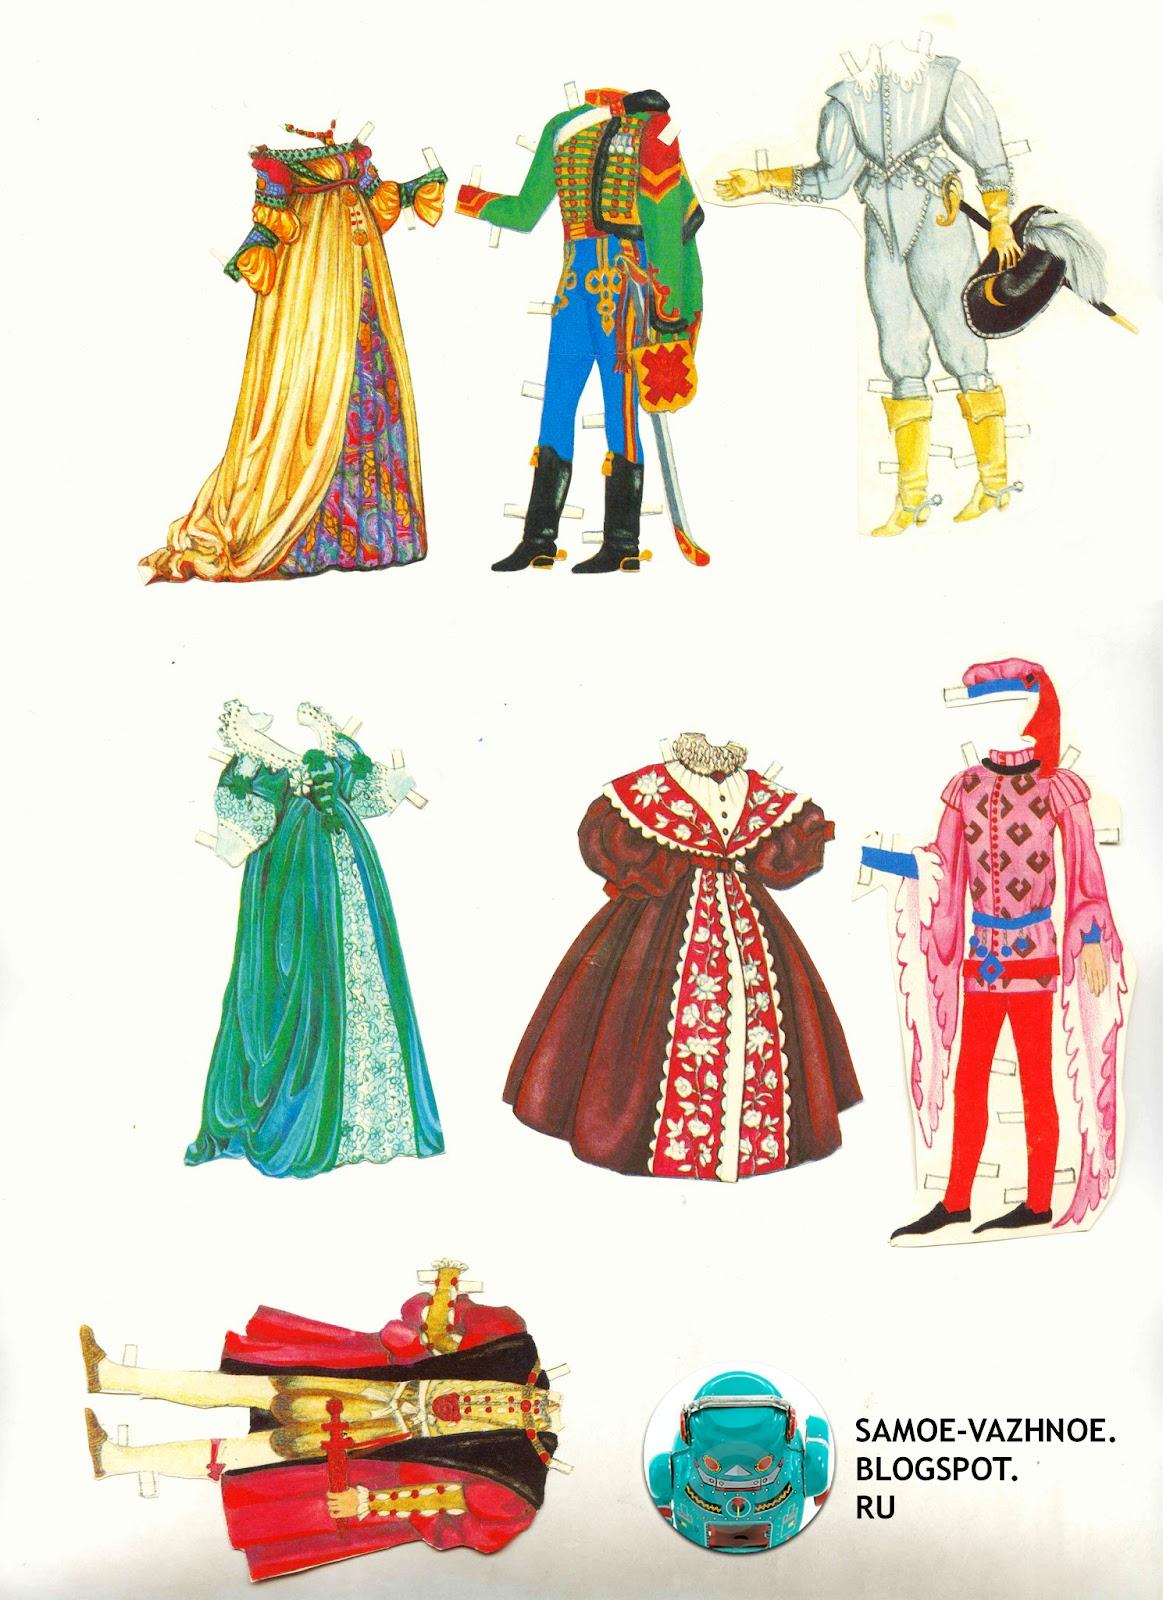 Бумажные куклы костюмы разных эпох девяностые 1990е 90е